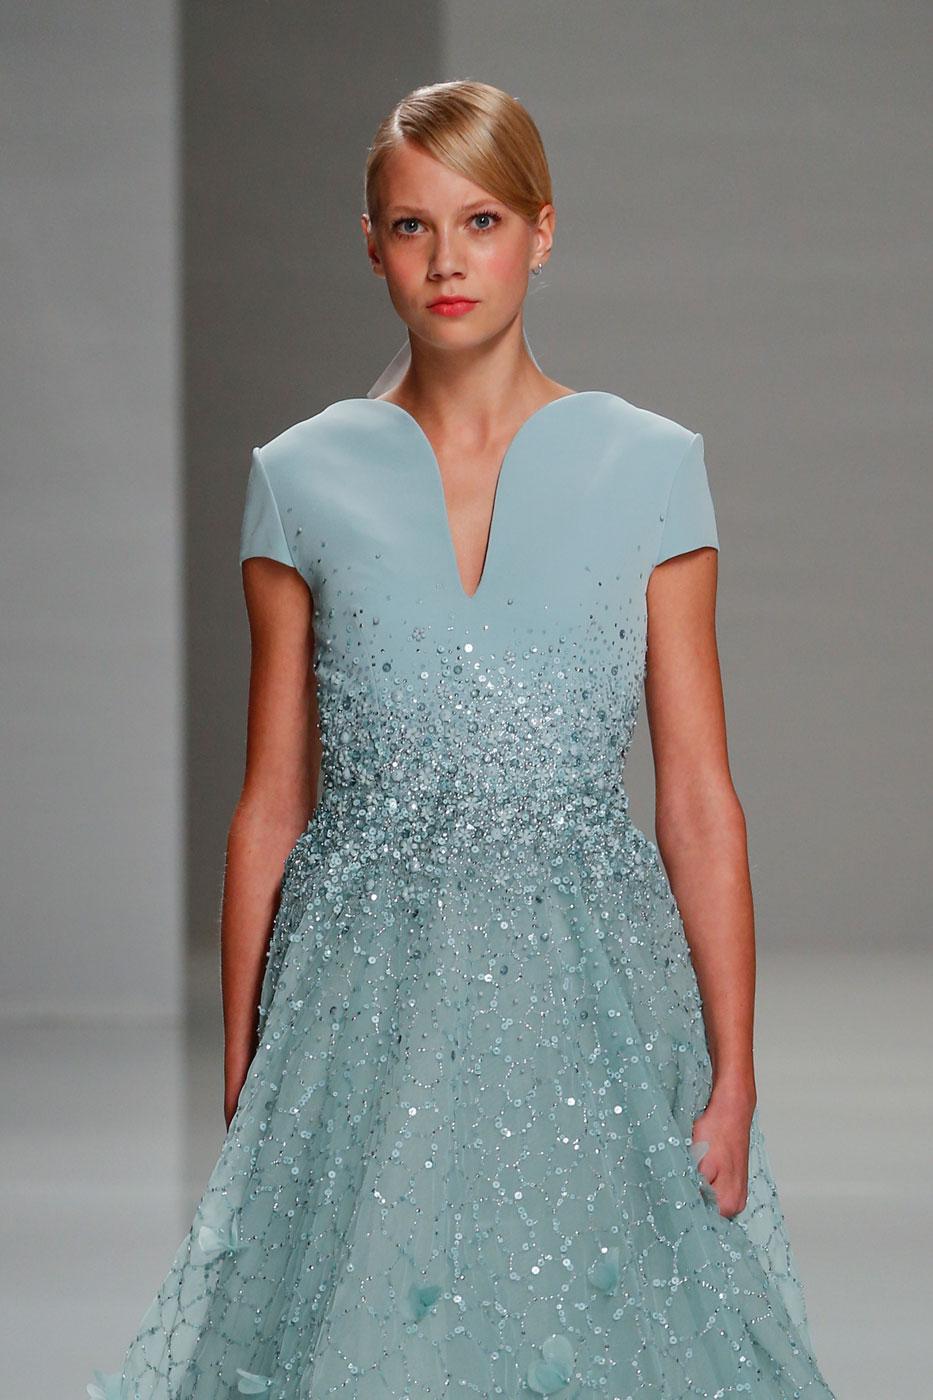 Georges-Hobeika-fashion-runway-show-haute-couture-paris-spring-2015-the-impression-76